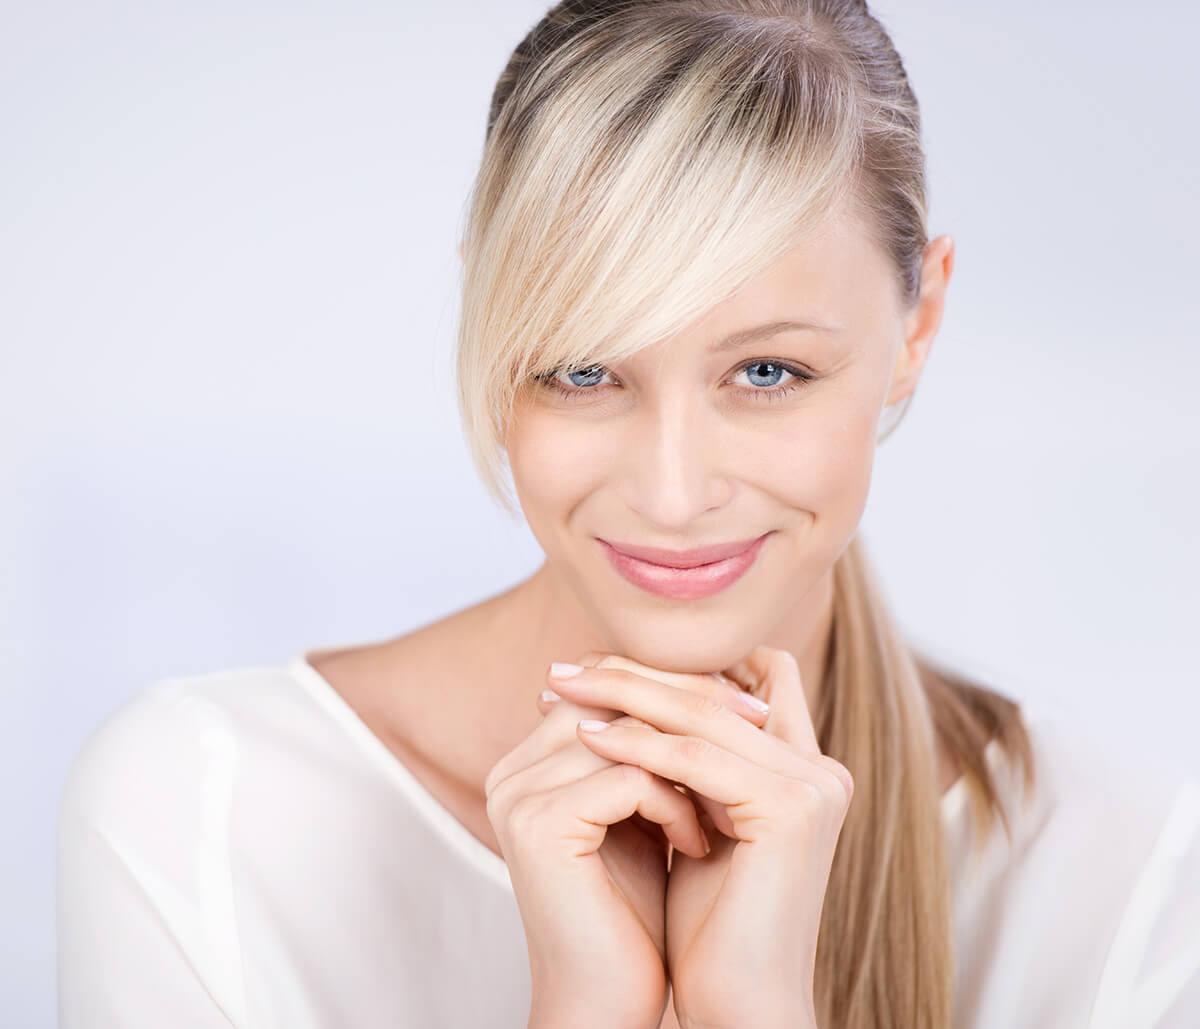 Cosmetic Dermatologist at Braun Dermatology & Skin Cancer Center in Washington DC Area